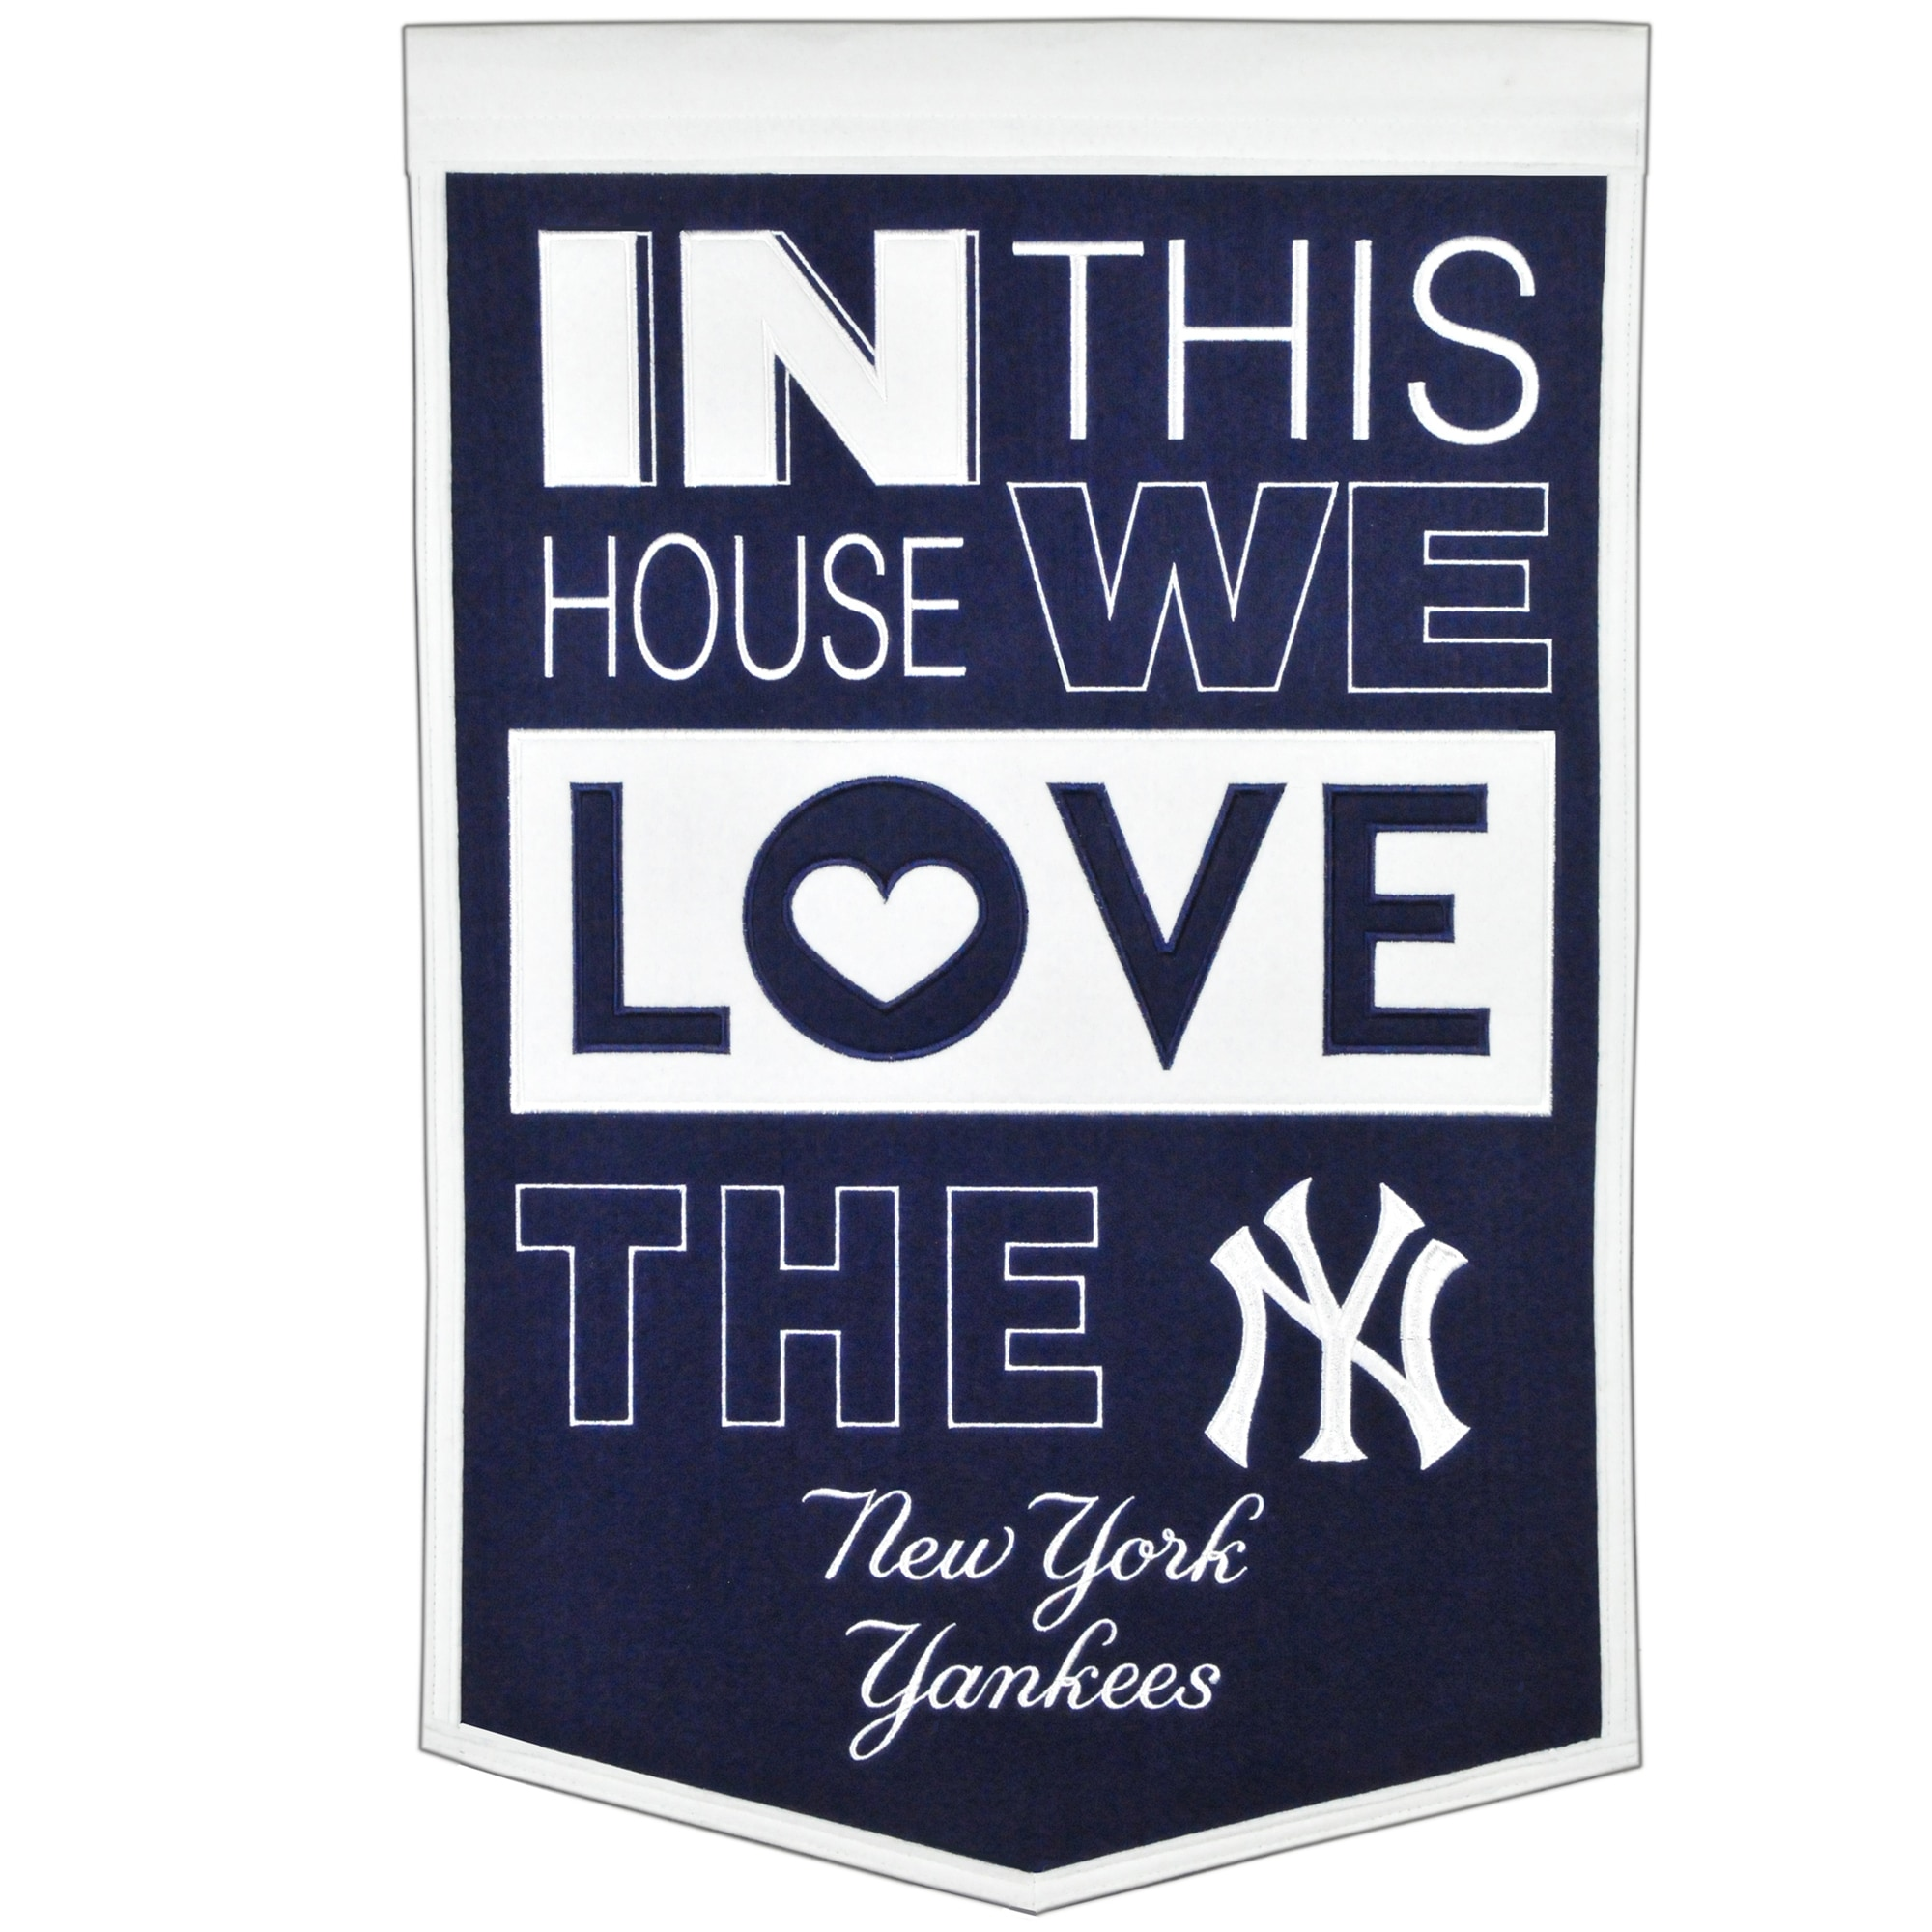 New York Yankees 15'' x 24'' Home Banner - Navy/White